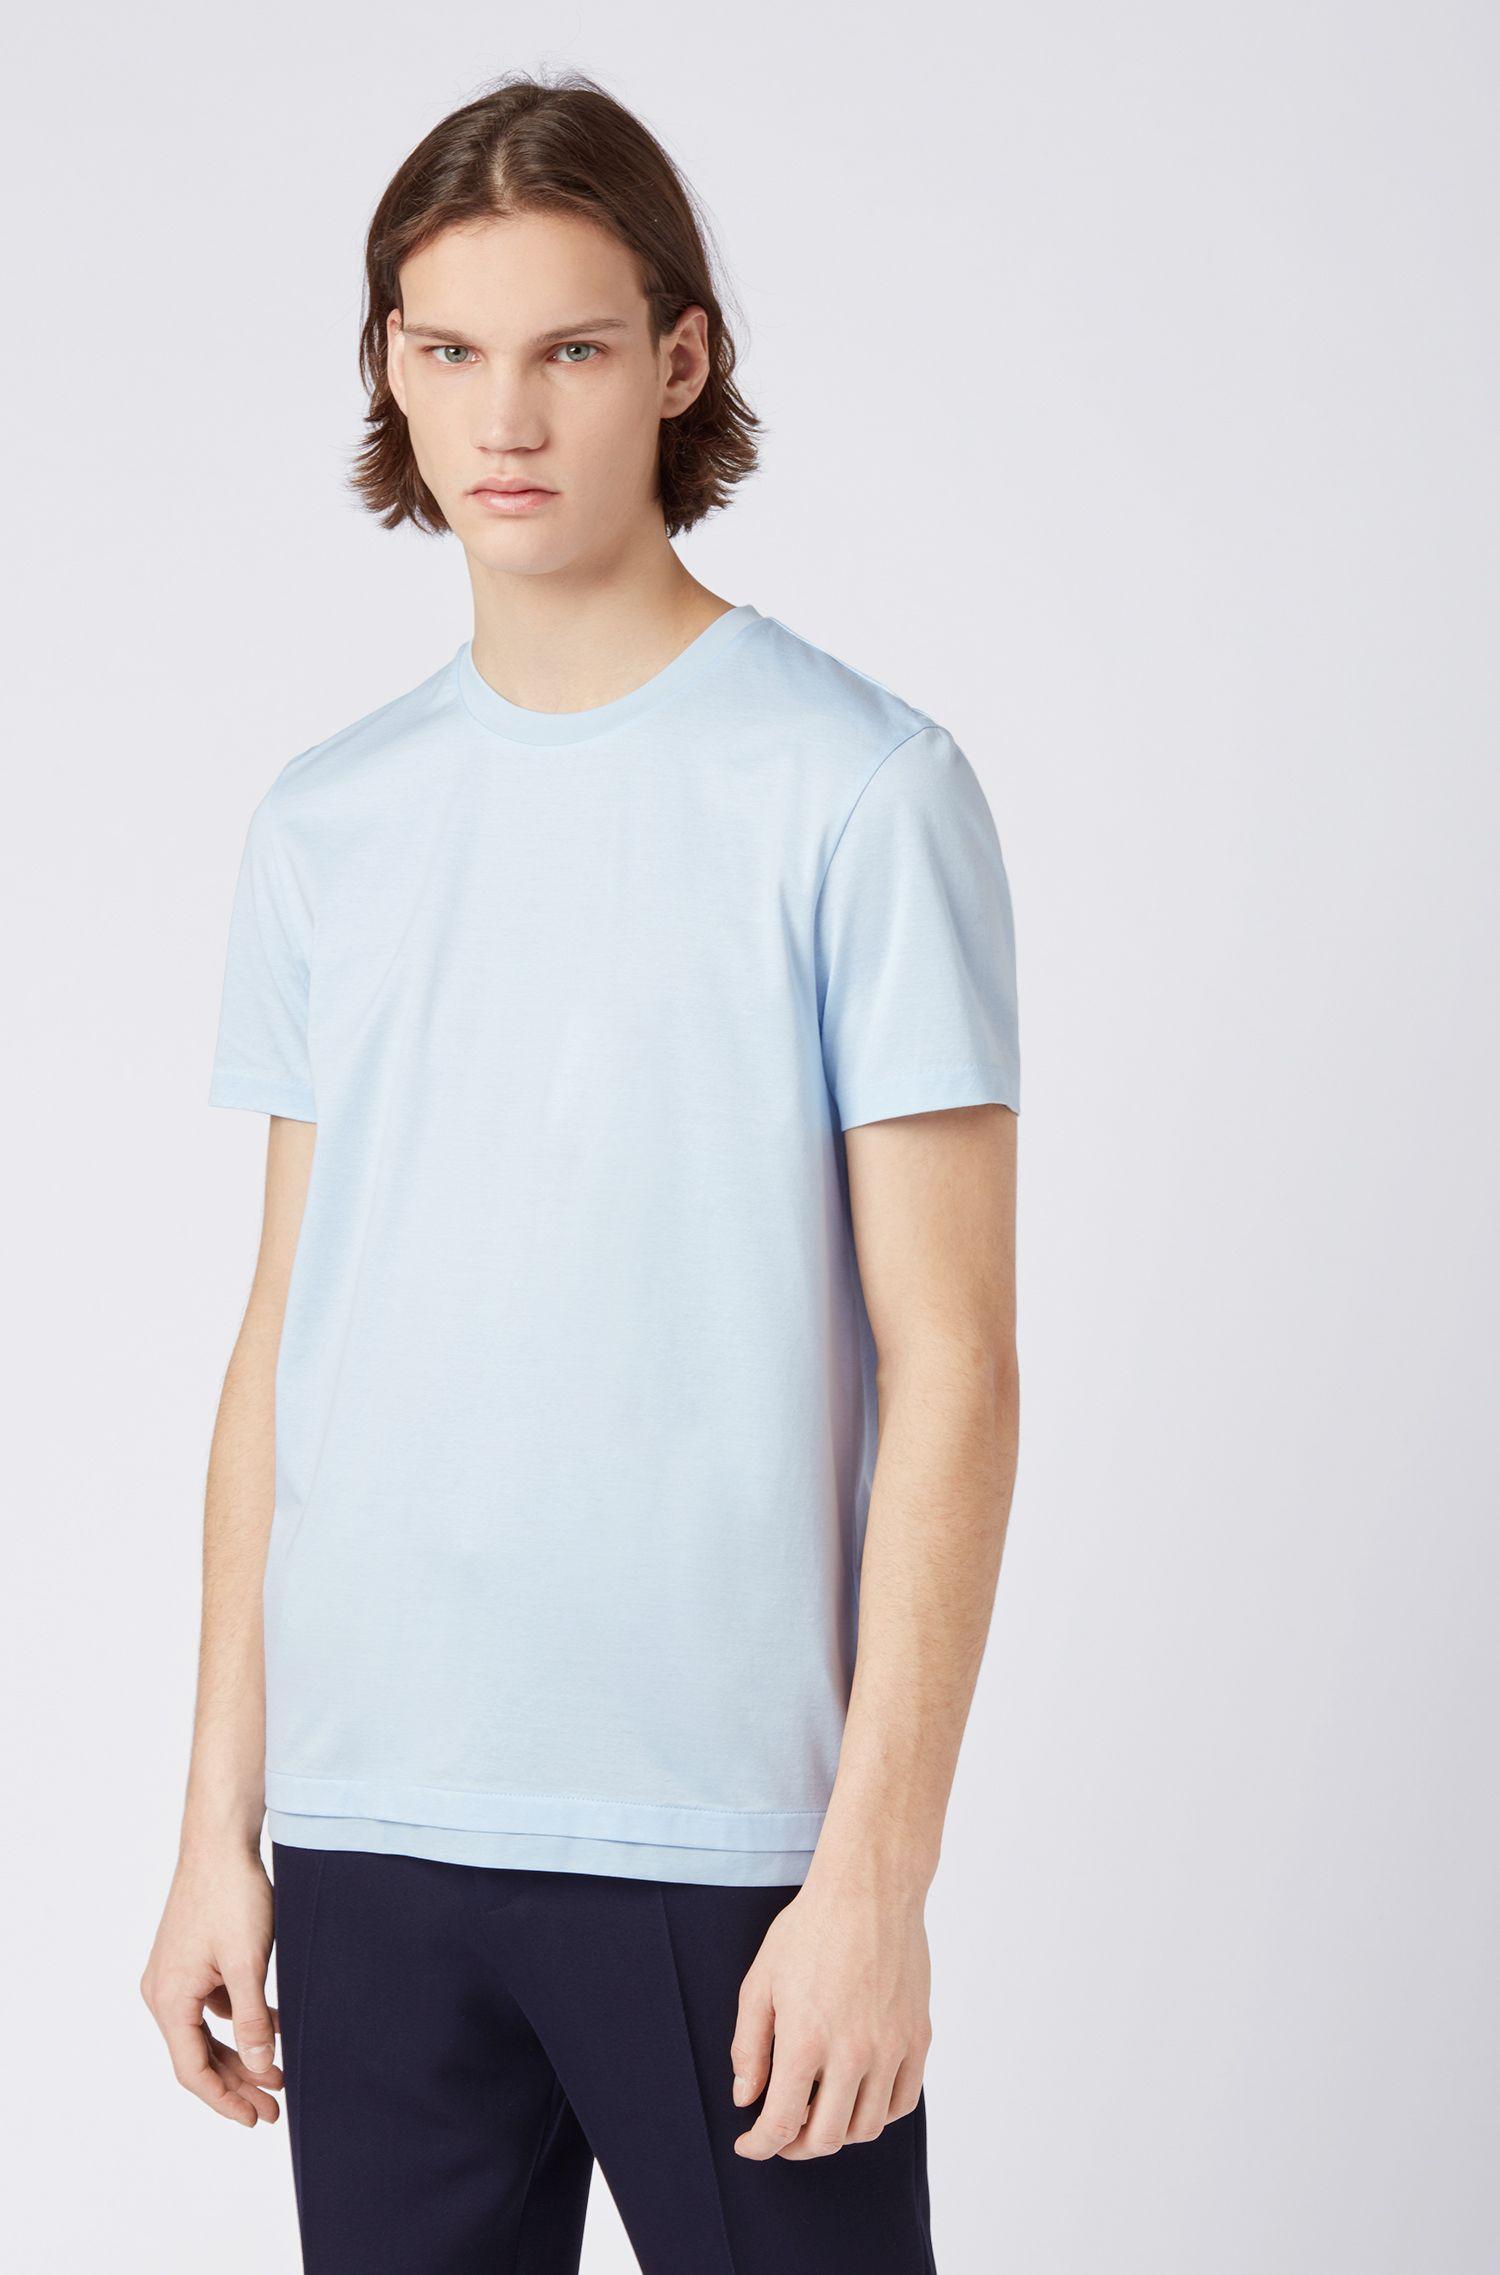 T-shirt slim fit in cotone mouliné mercerizzato, Celeste